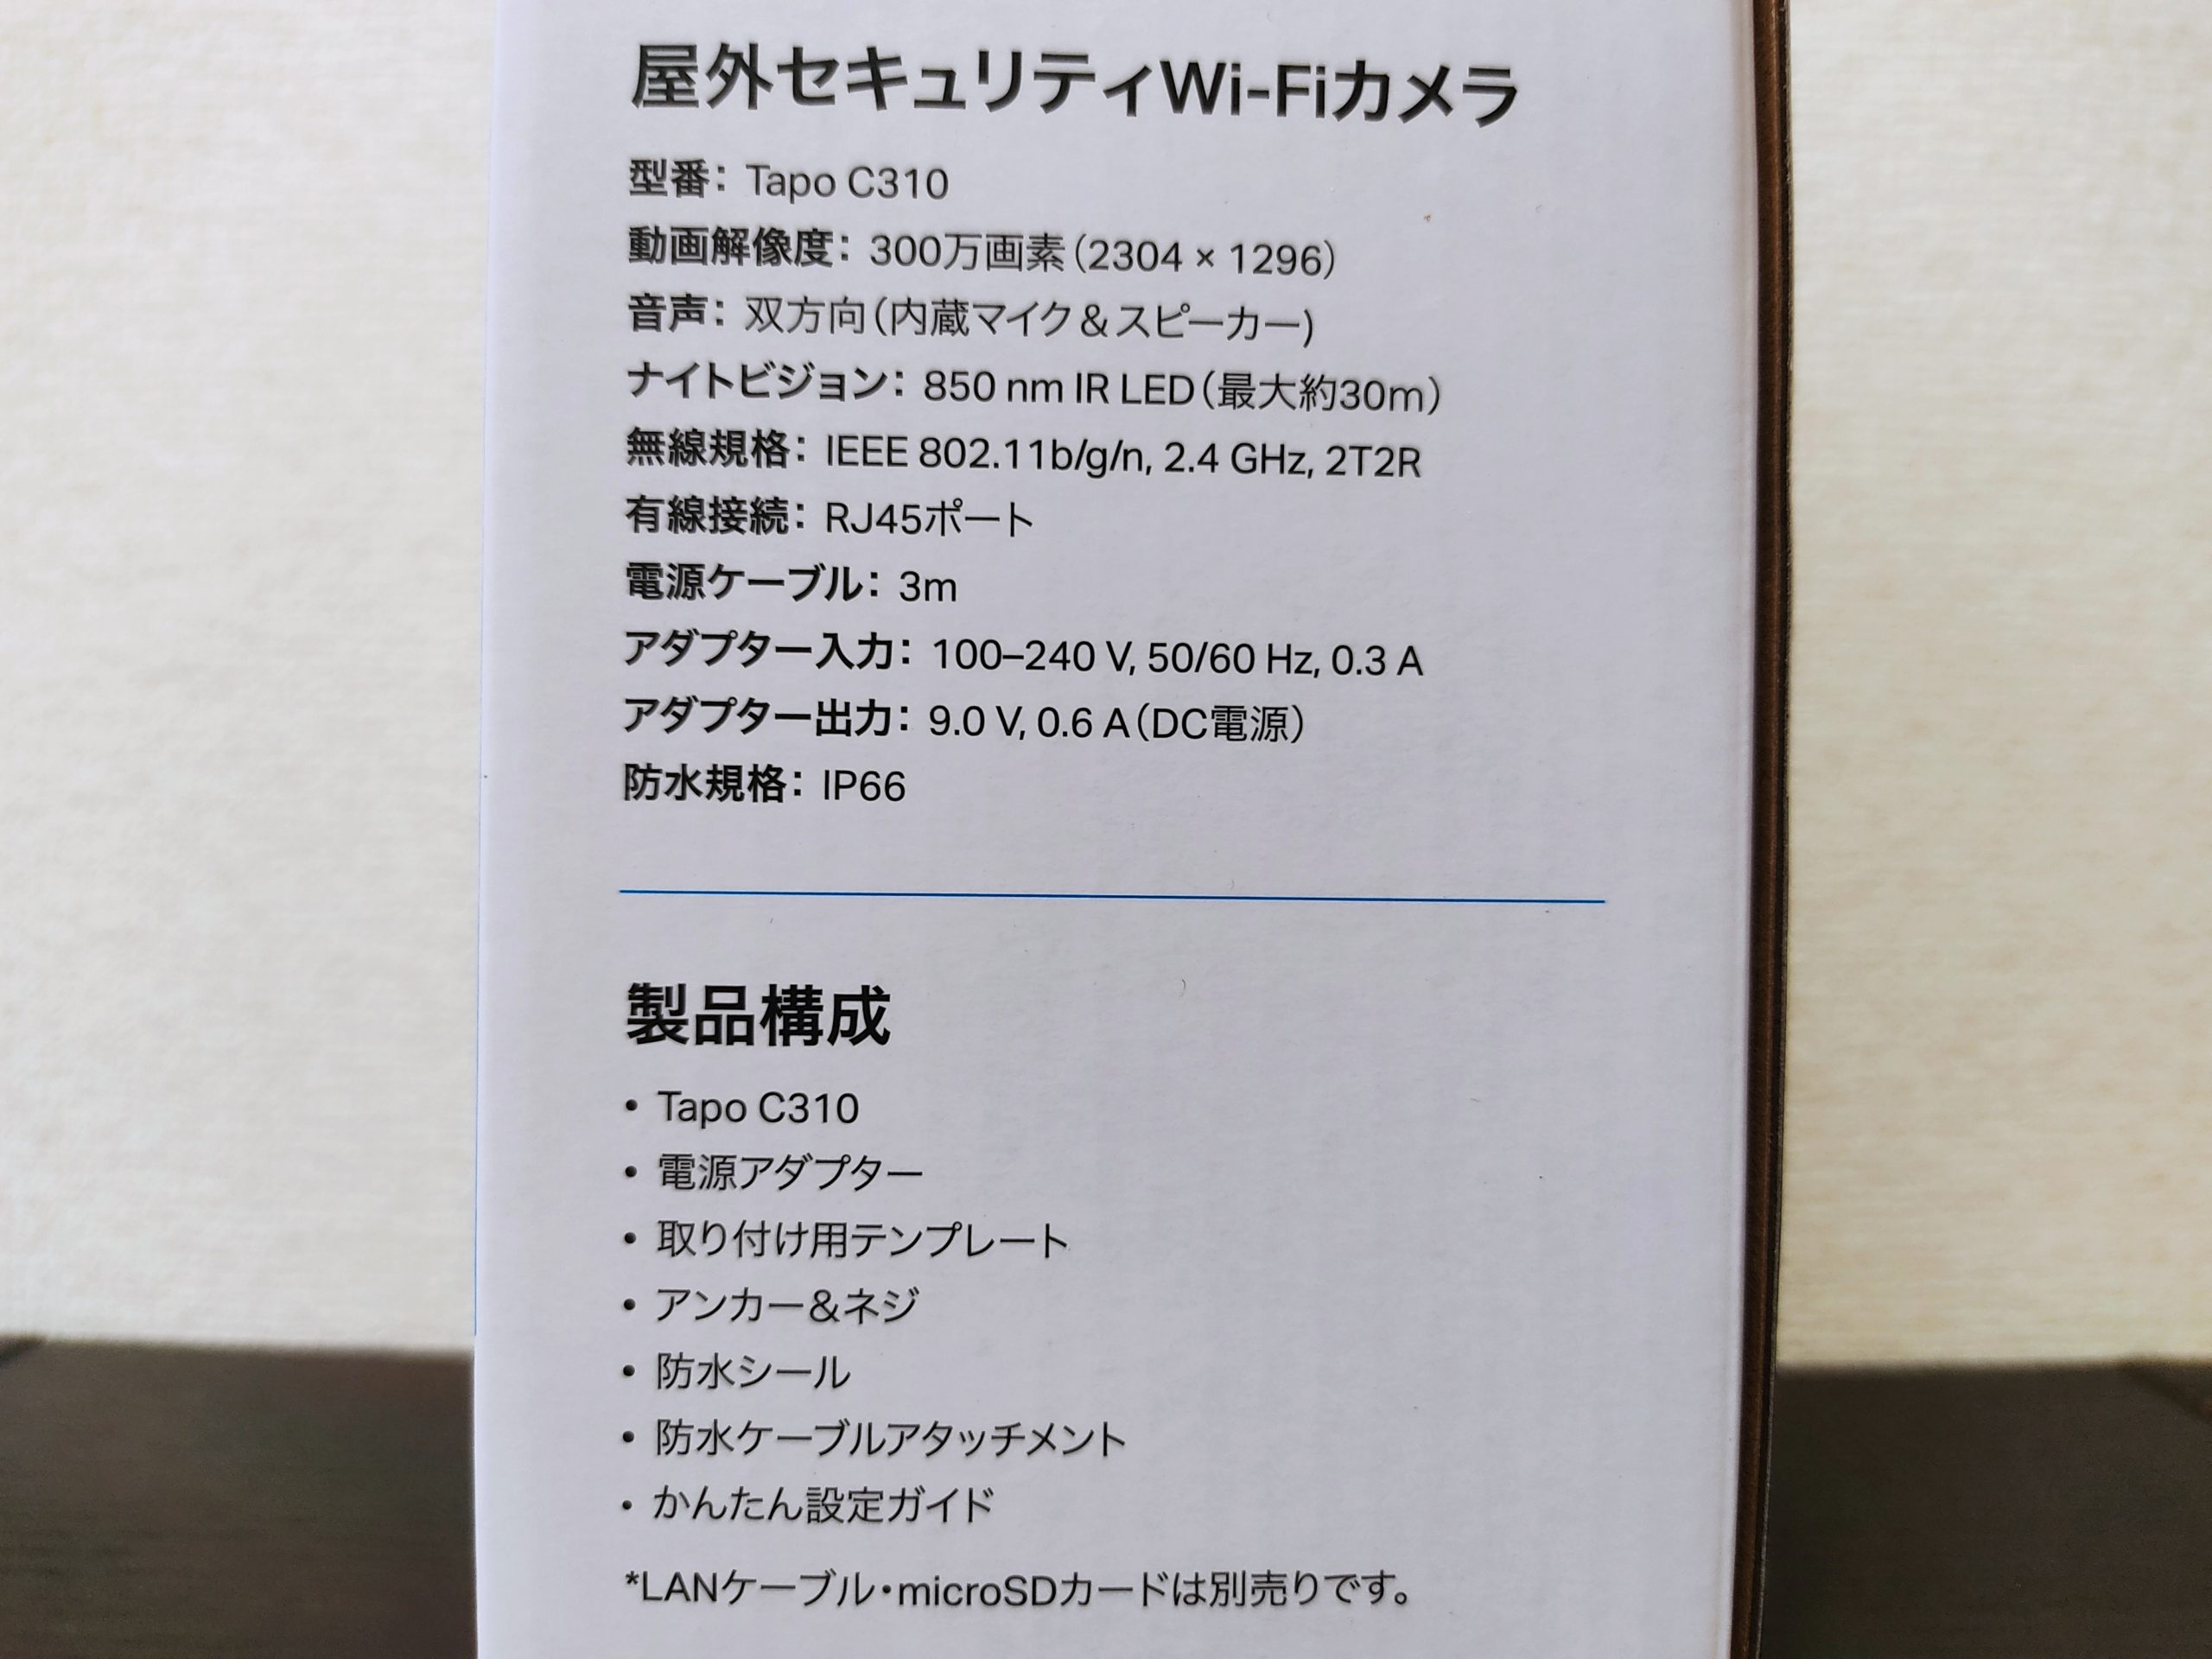 「Tapo C310」の詳細スペック